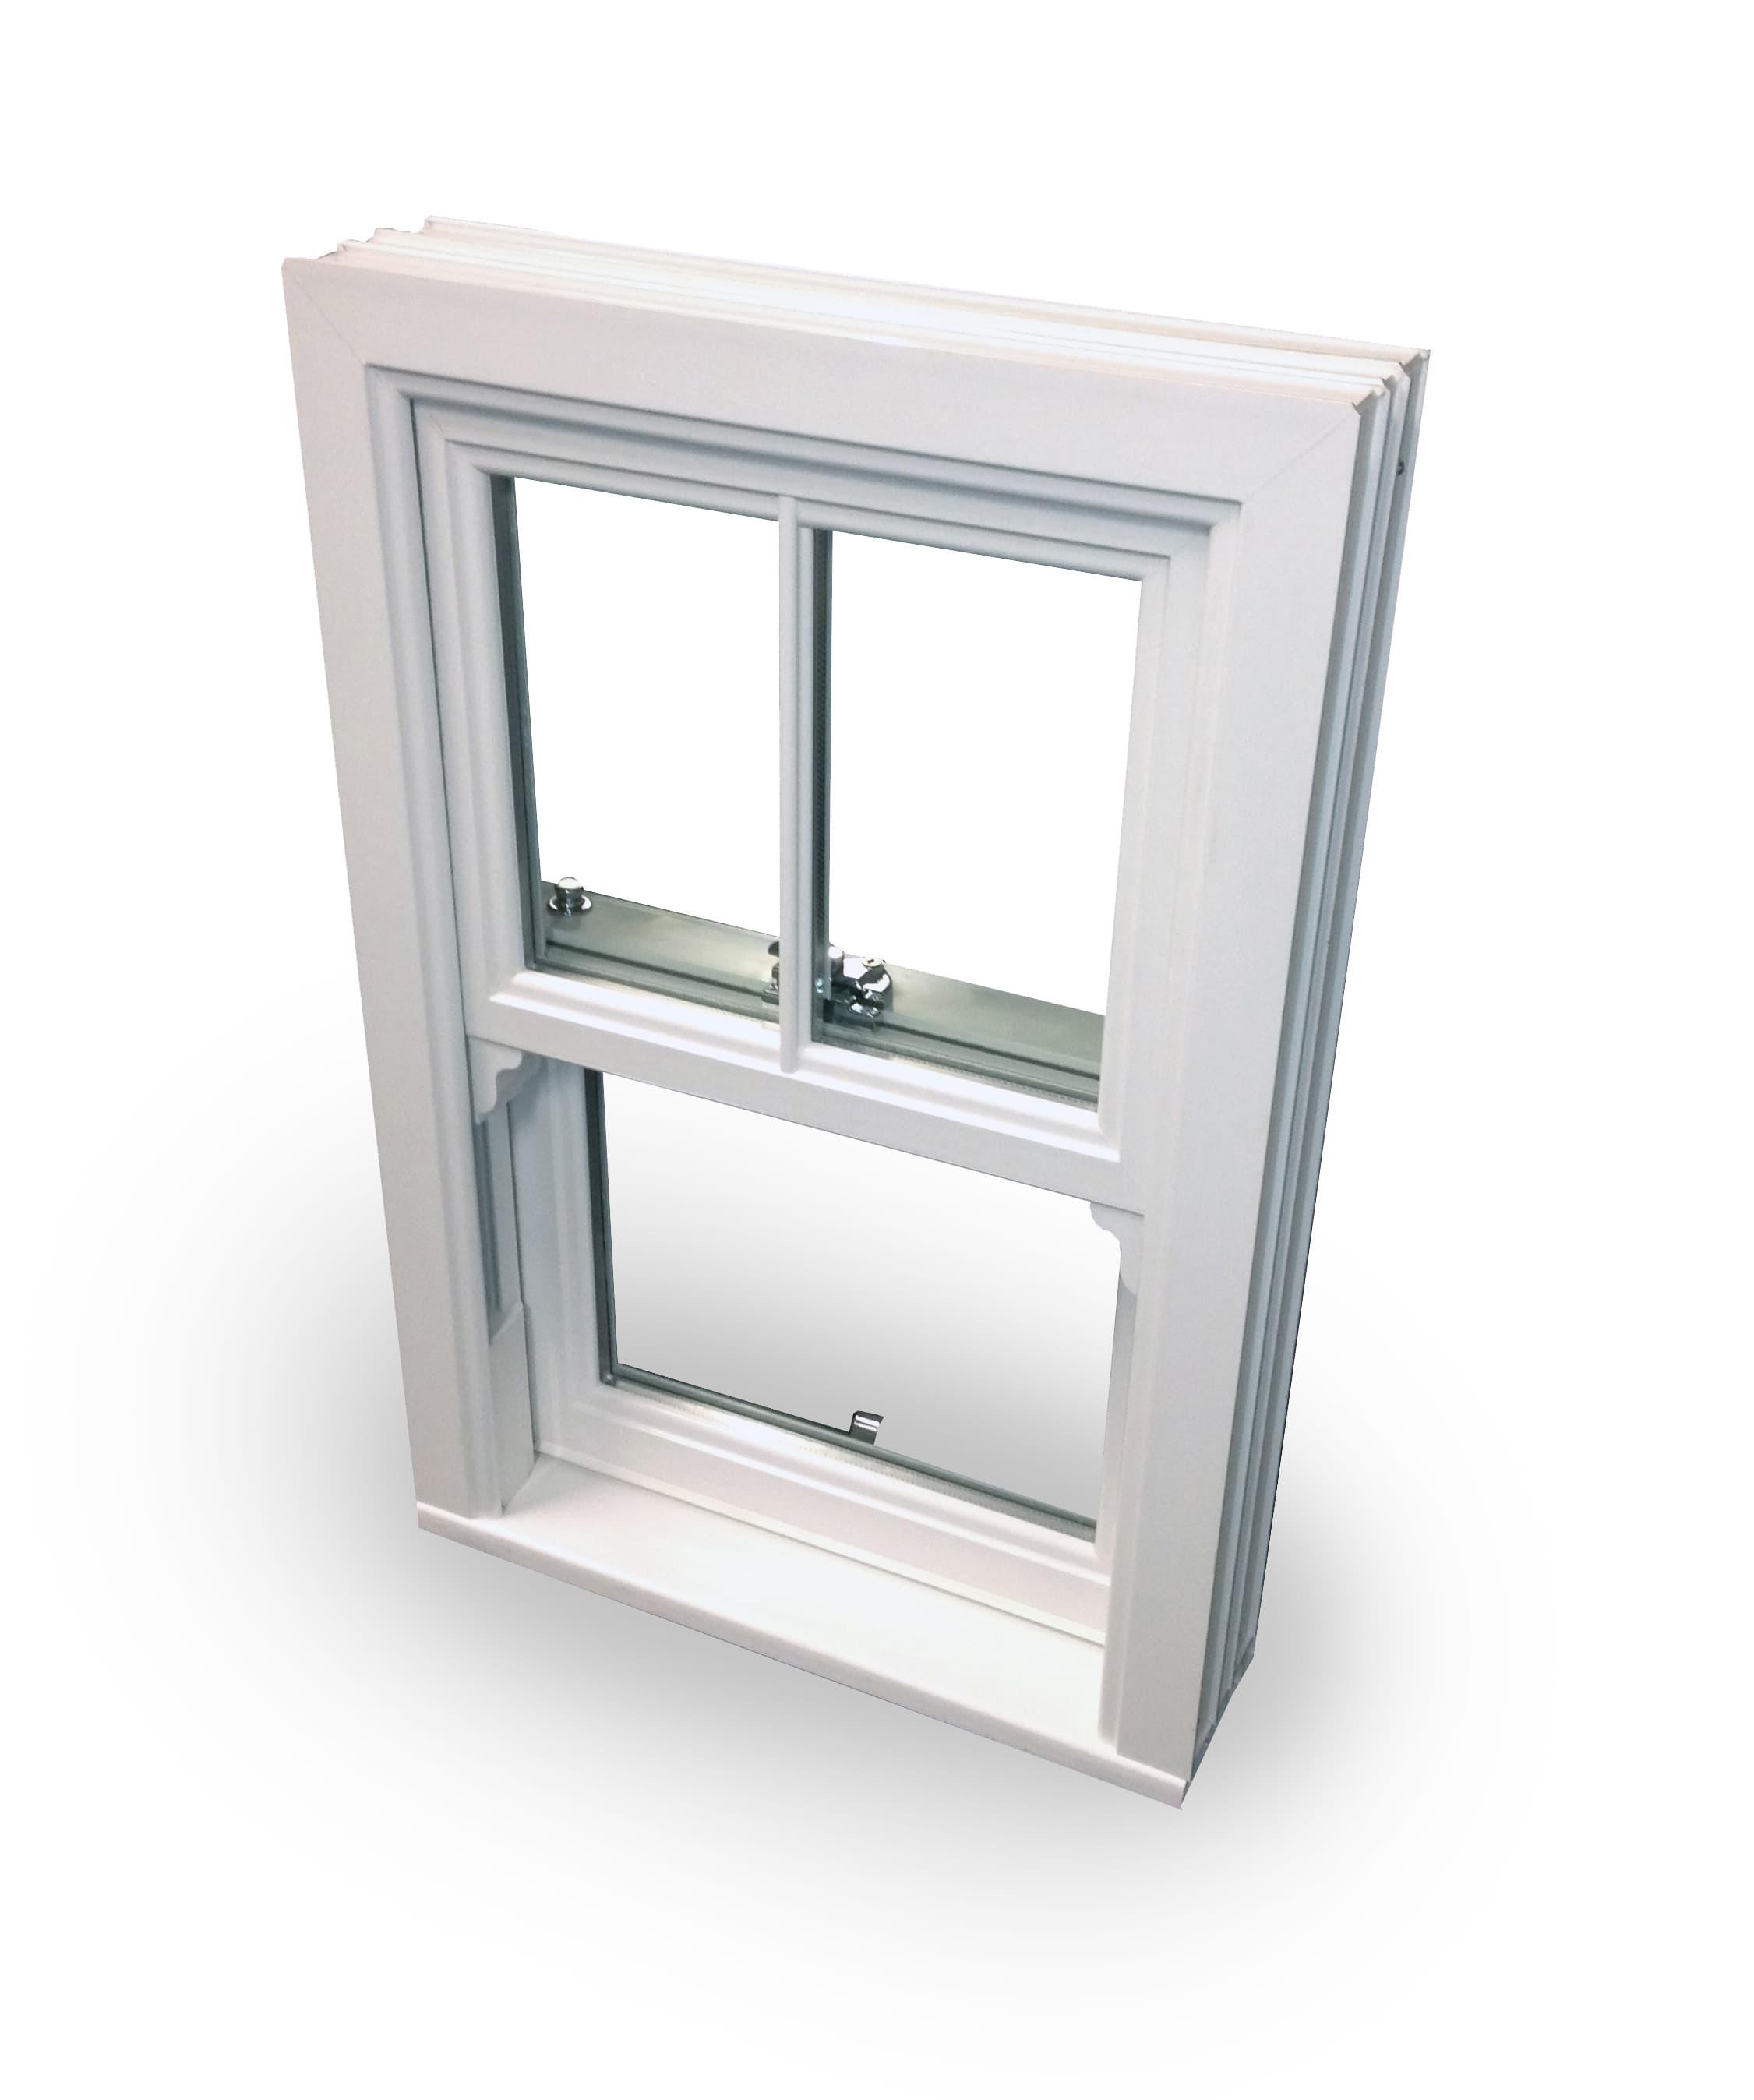 Double glazed windows maidstone kent upvc windows for Double glazing